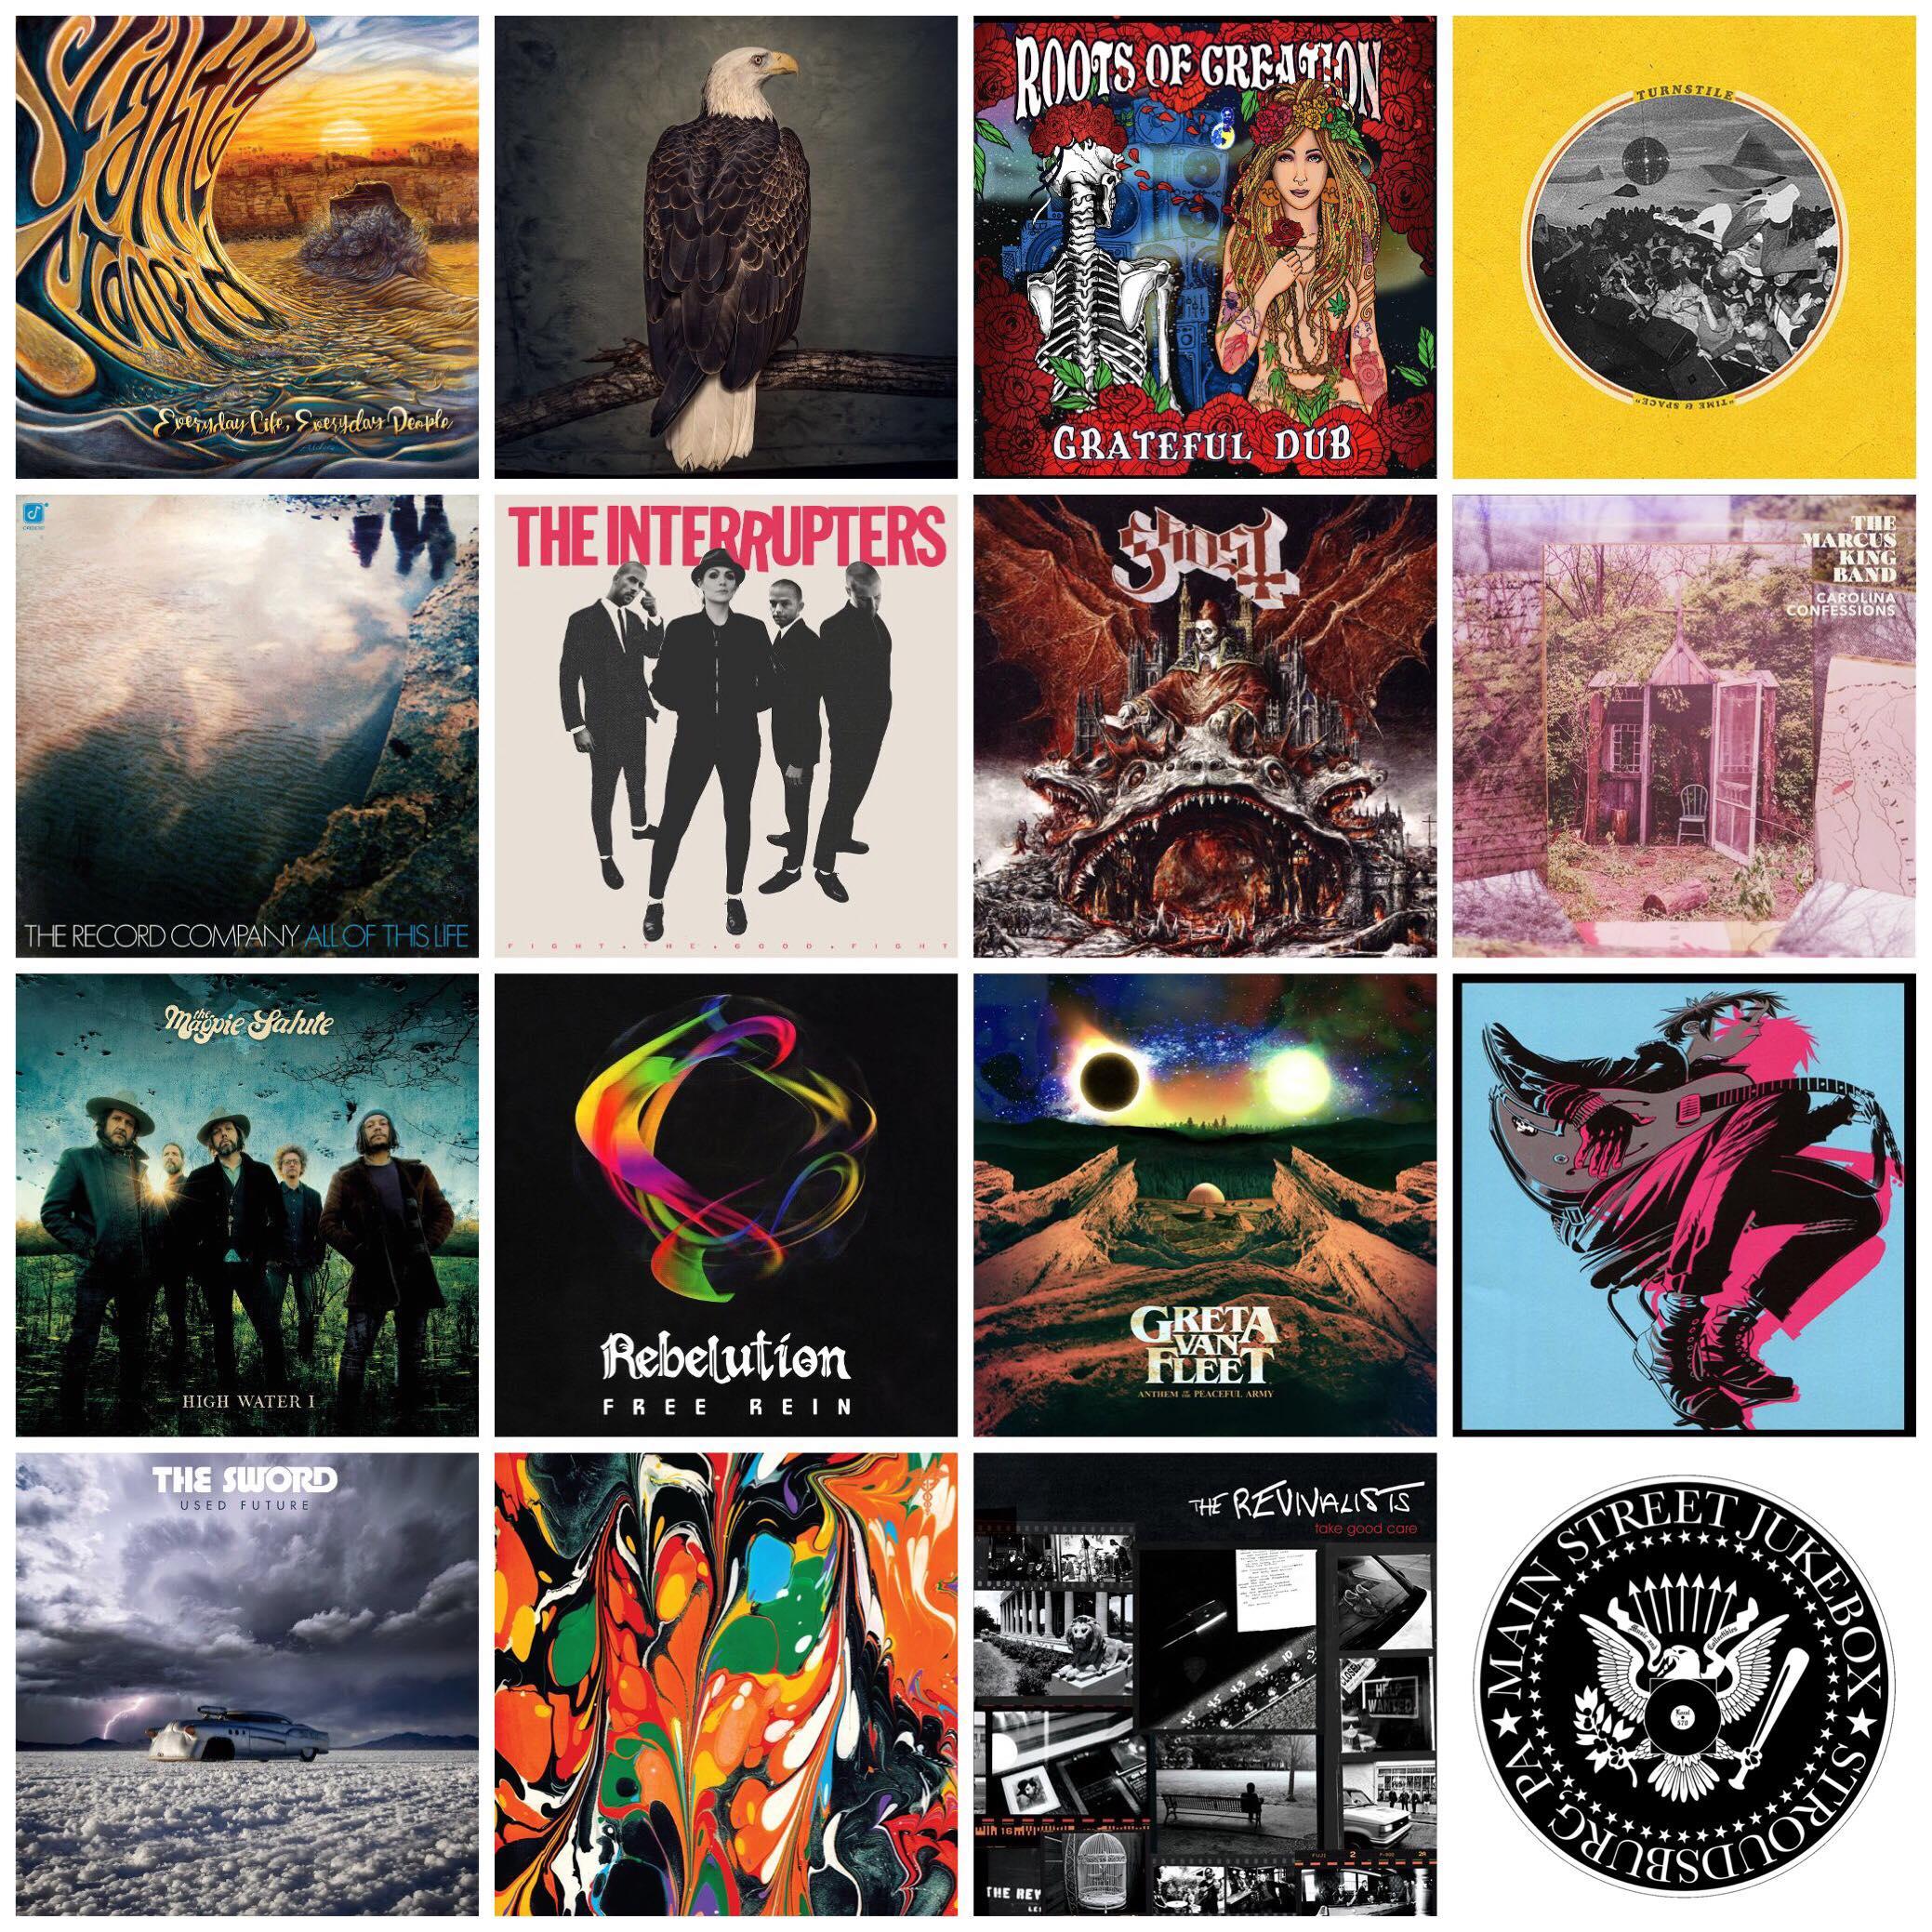 MAIN ST. JUKEBOX'S TOM LEFEVRE'S FAVORITE ALBUMS OF THE YEAR